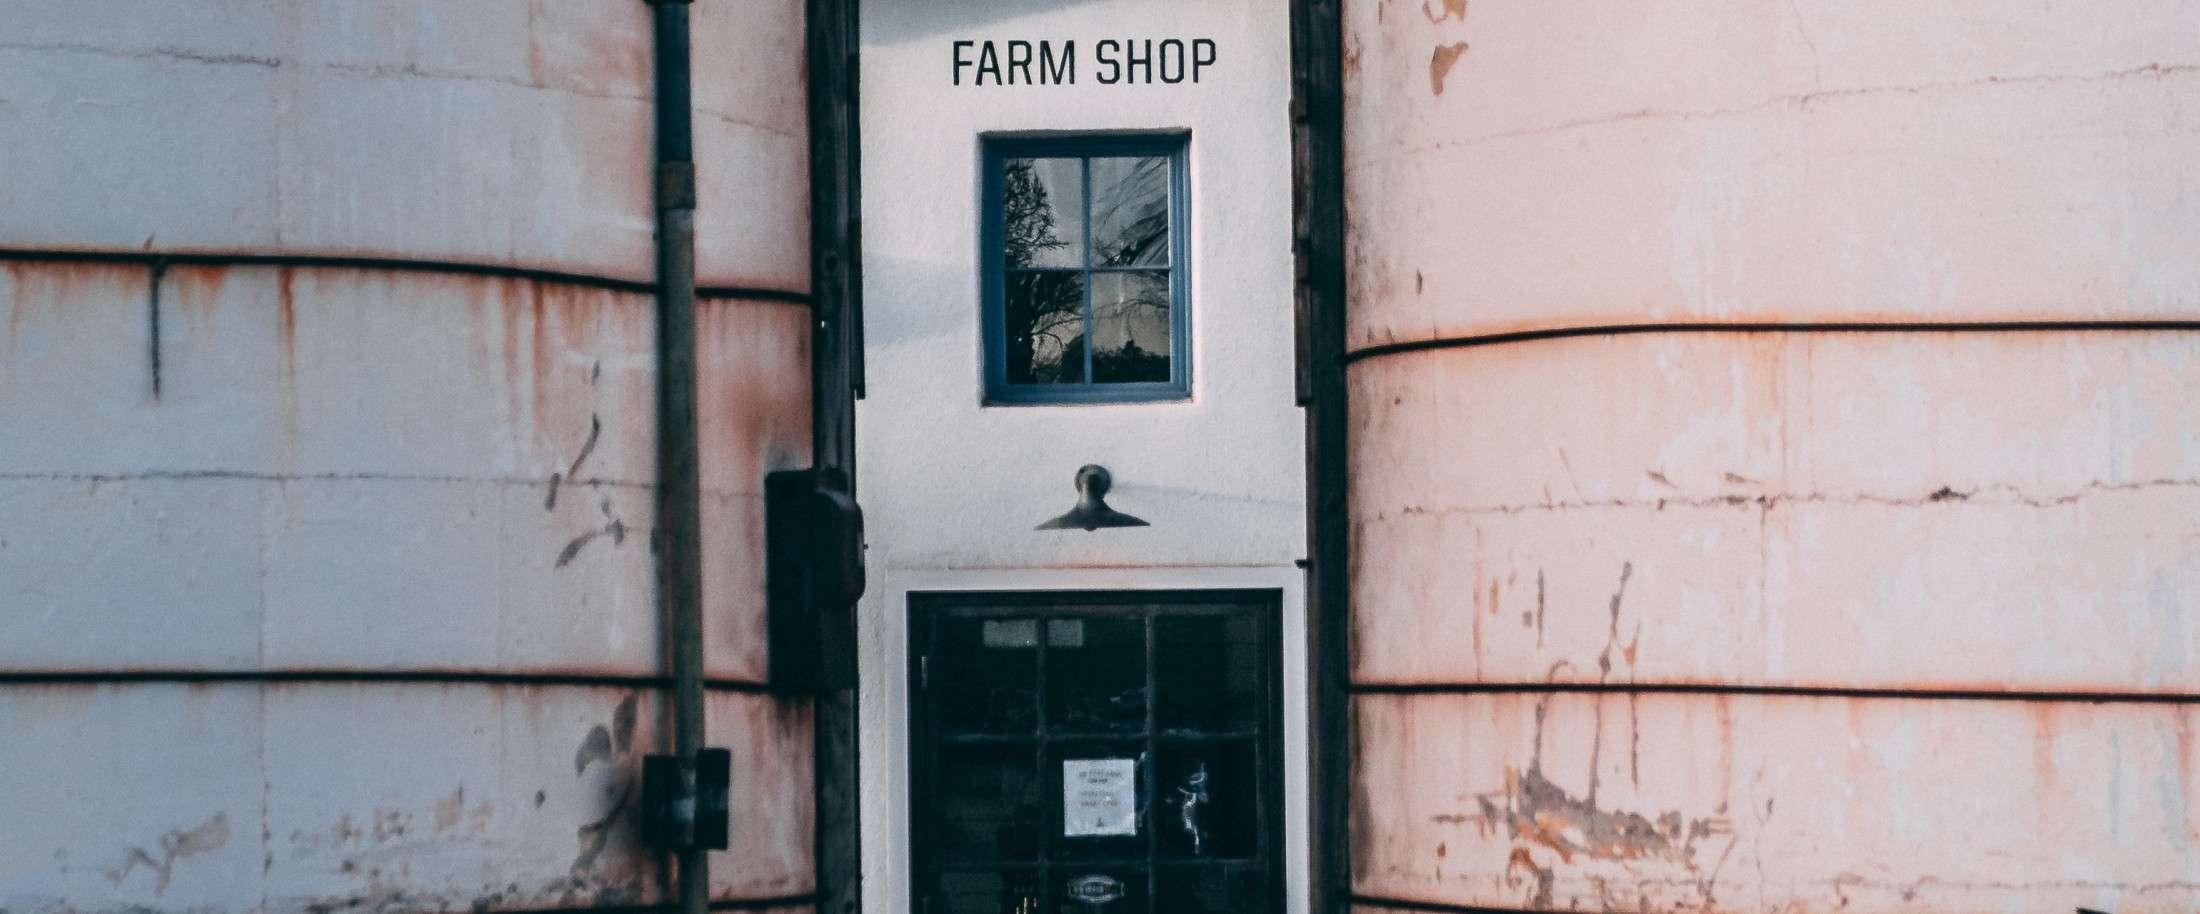 Agri-Tourism and Food